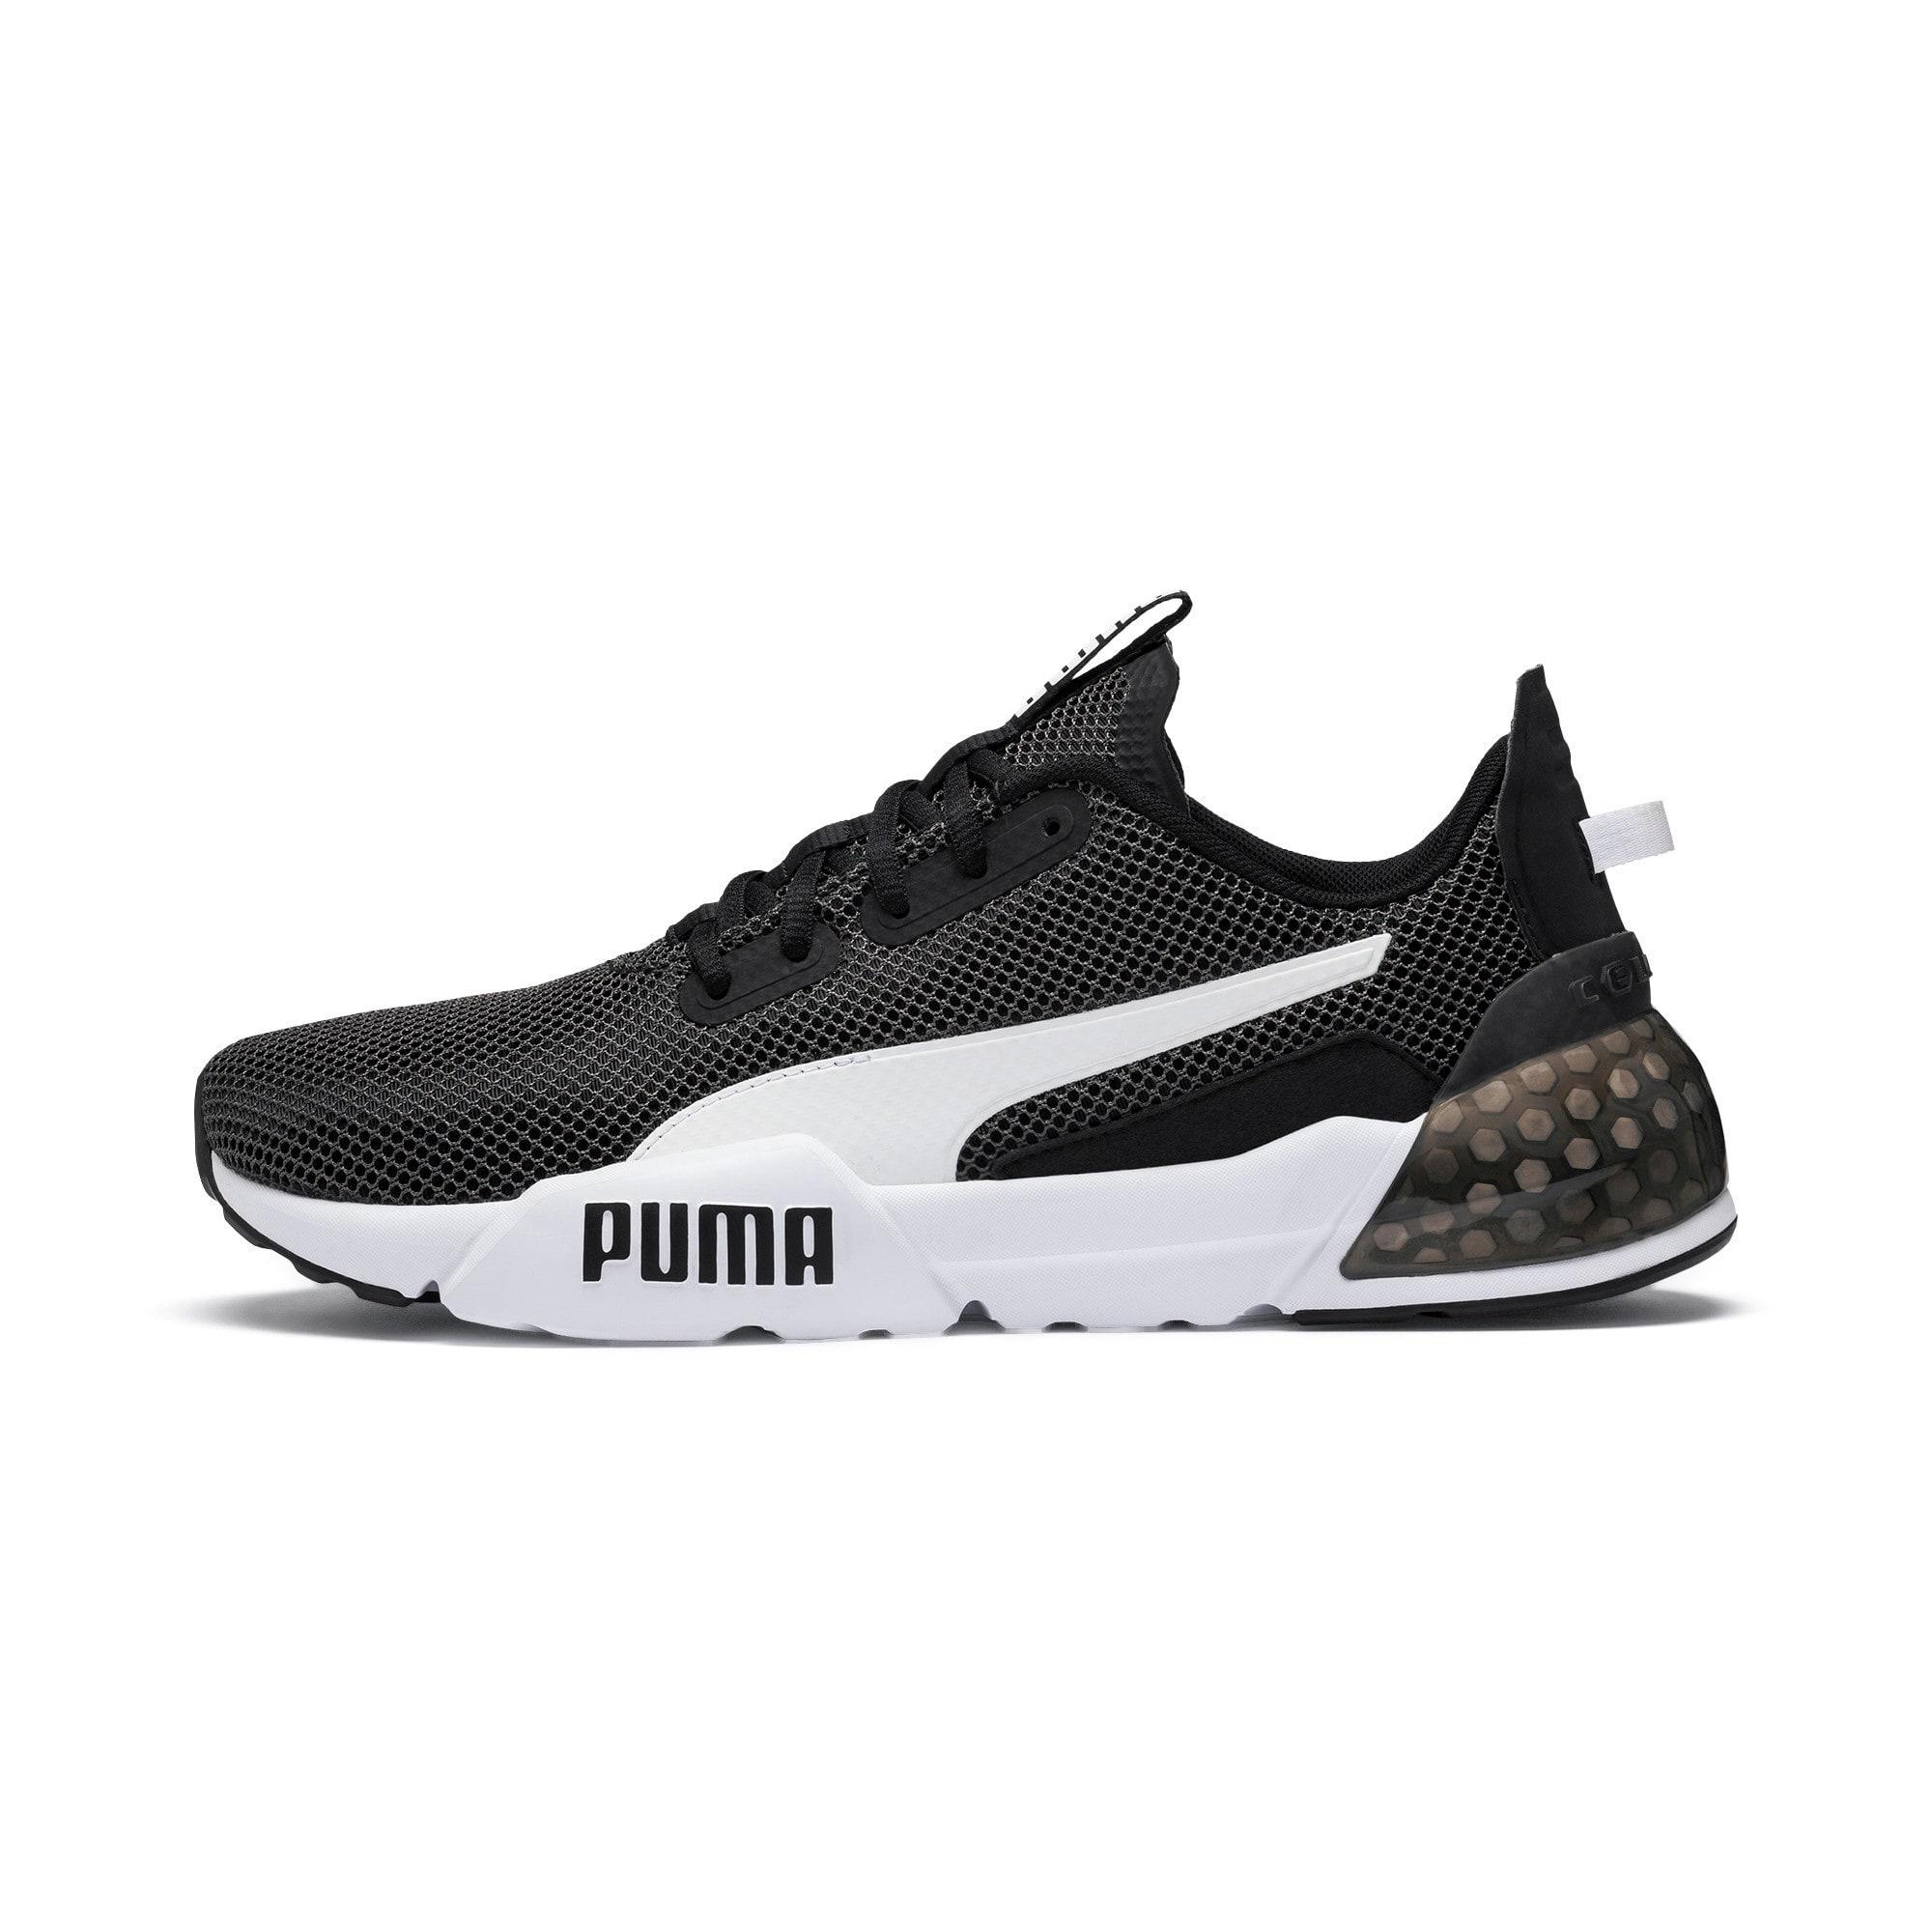 Thumbnail 1 of CELL Phase Men's Training Shoes, Puma Black-Puma White, medium